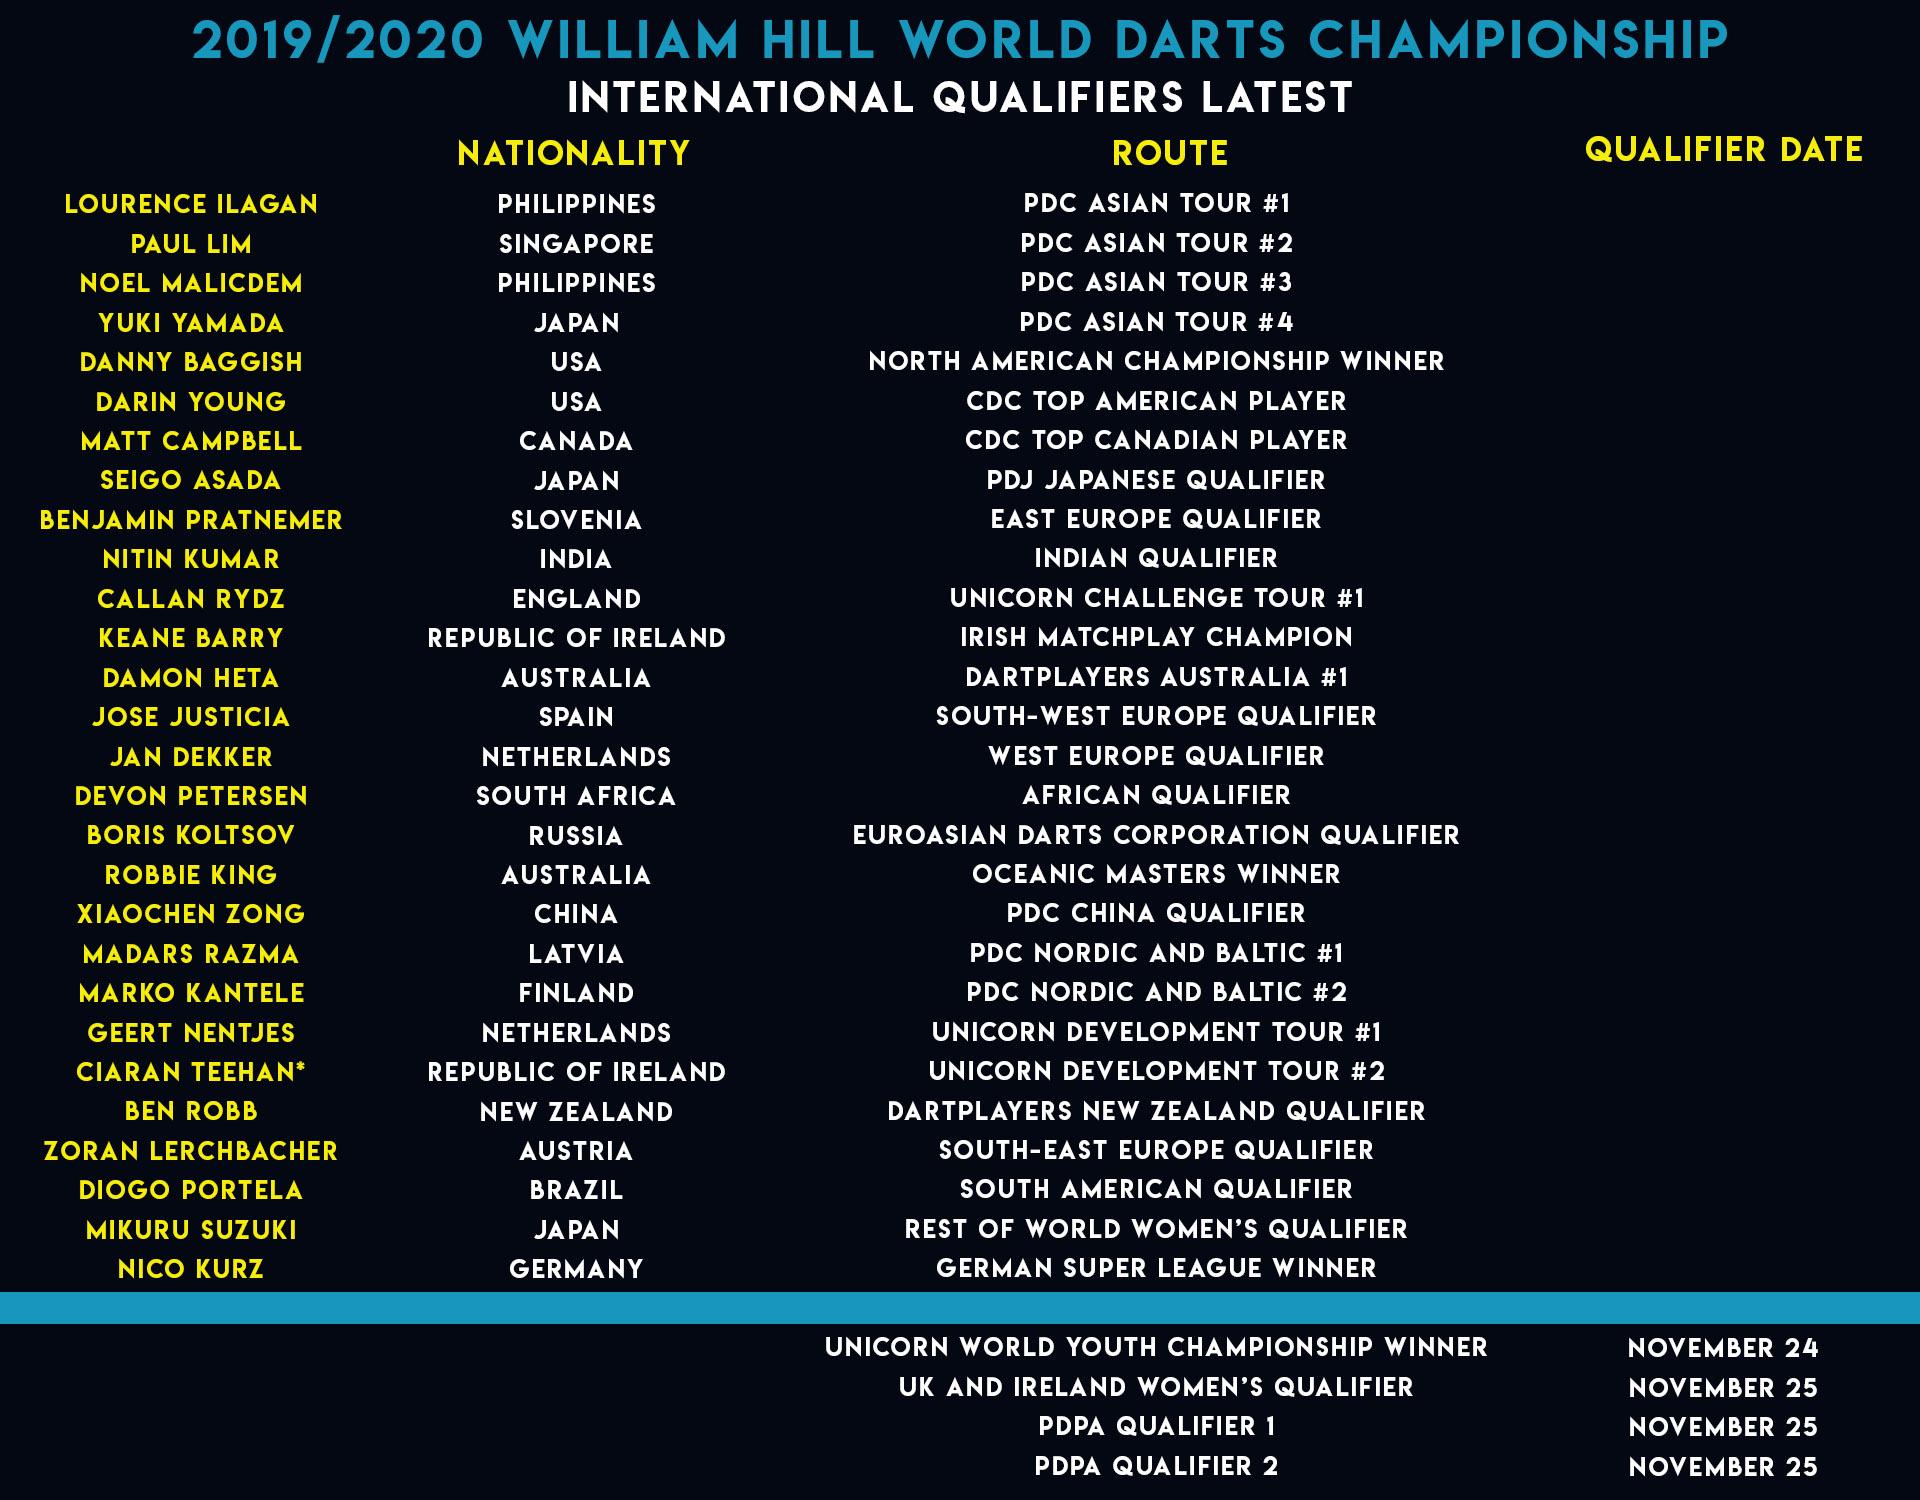 World Championship International Qualifiers list (PDC)